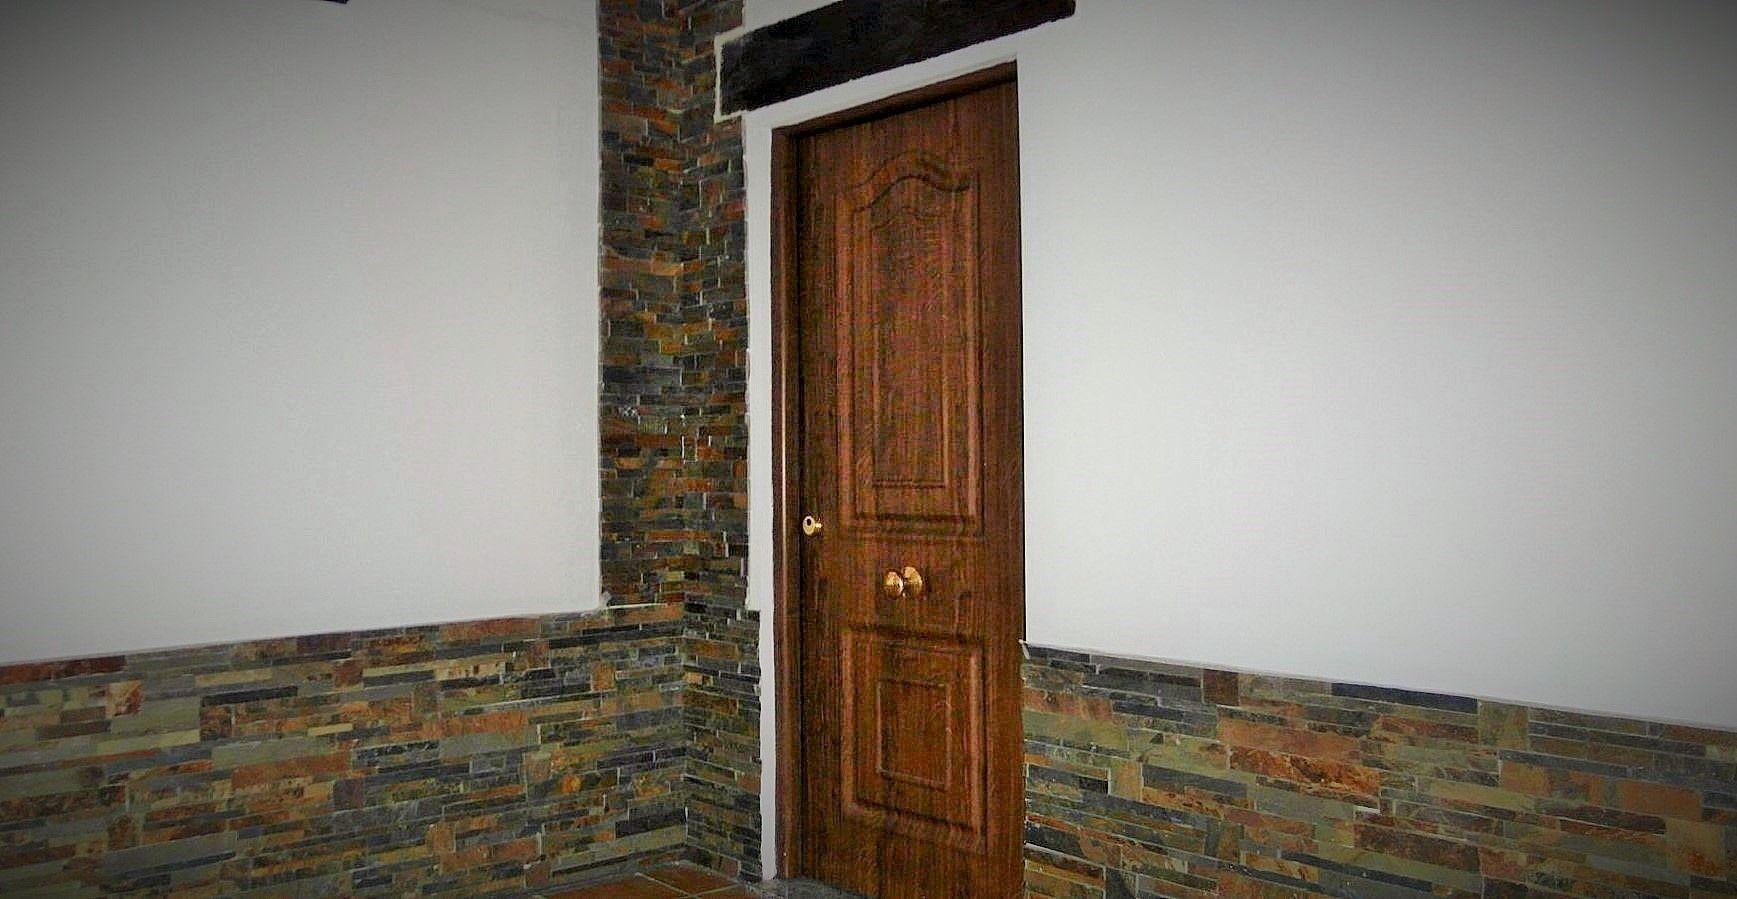 Acabado exterior casa prefabricada de hormigon zocalo de piedra de